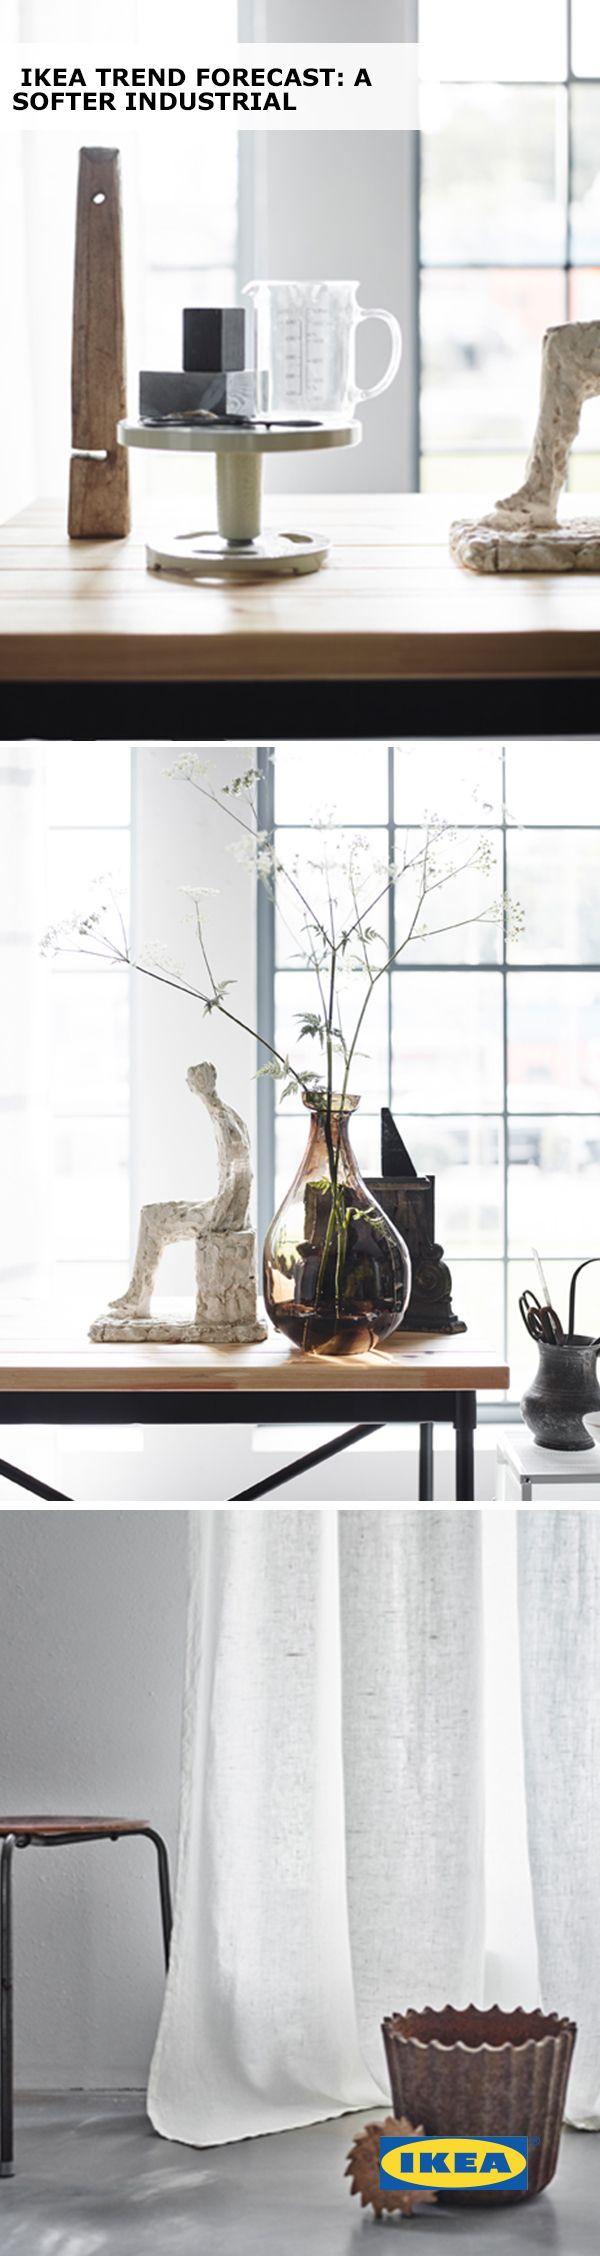 18 Best Modern Home Images On Pinterest